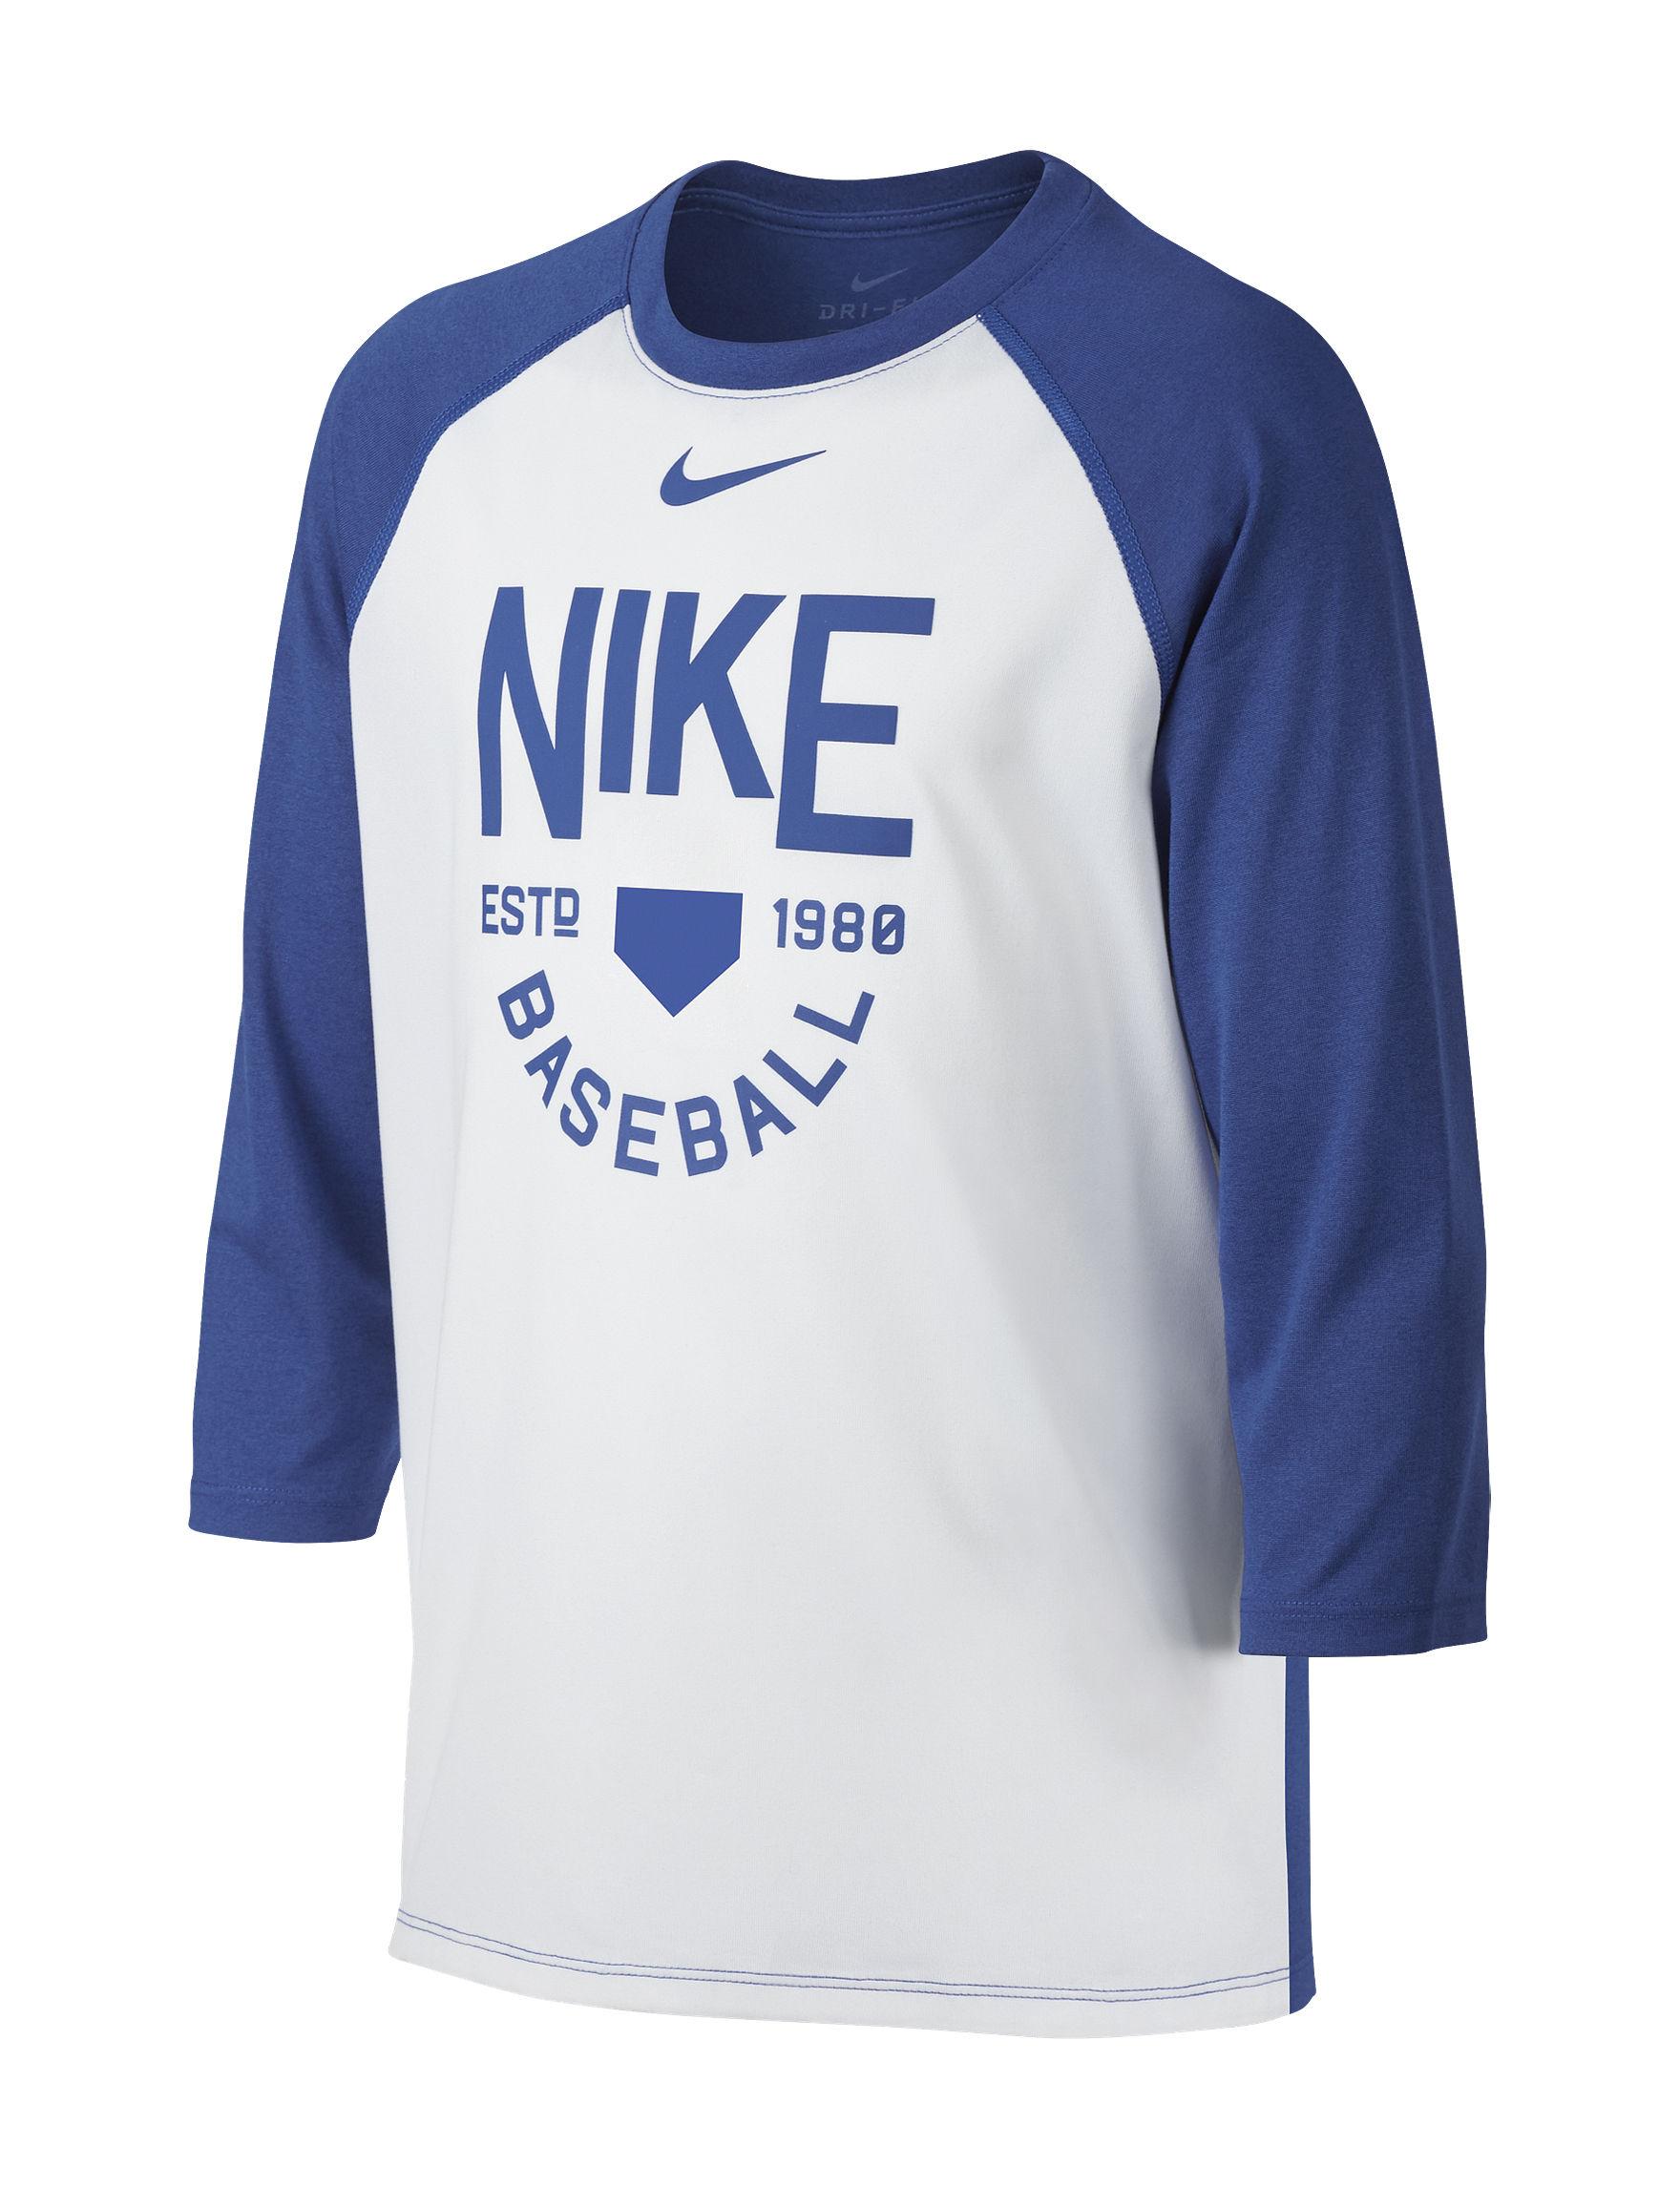 Nike White / Blue